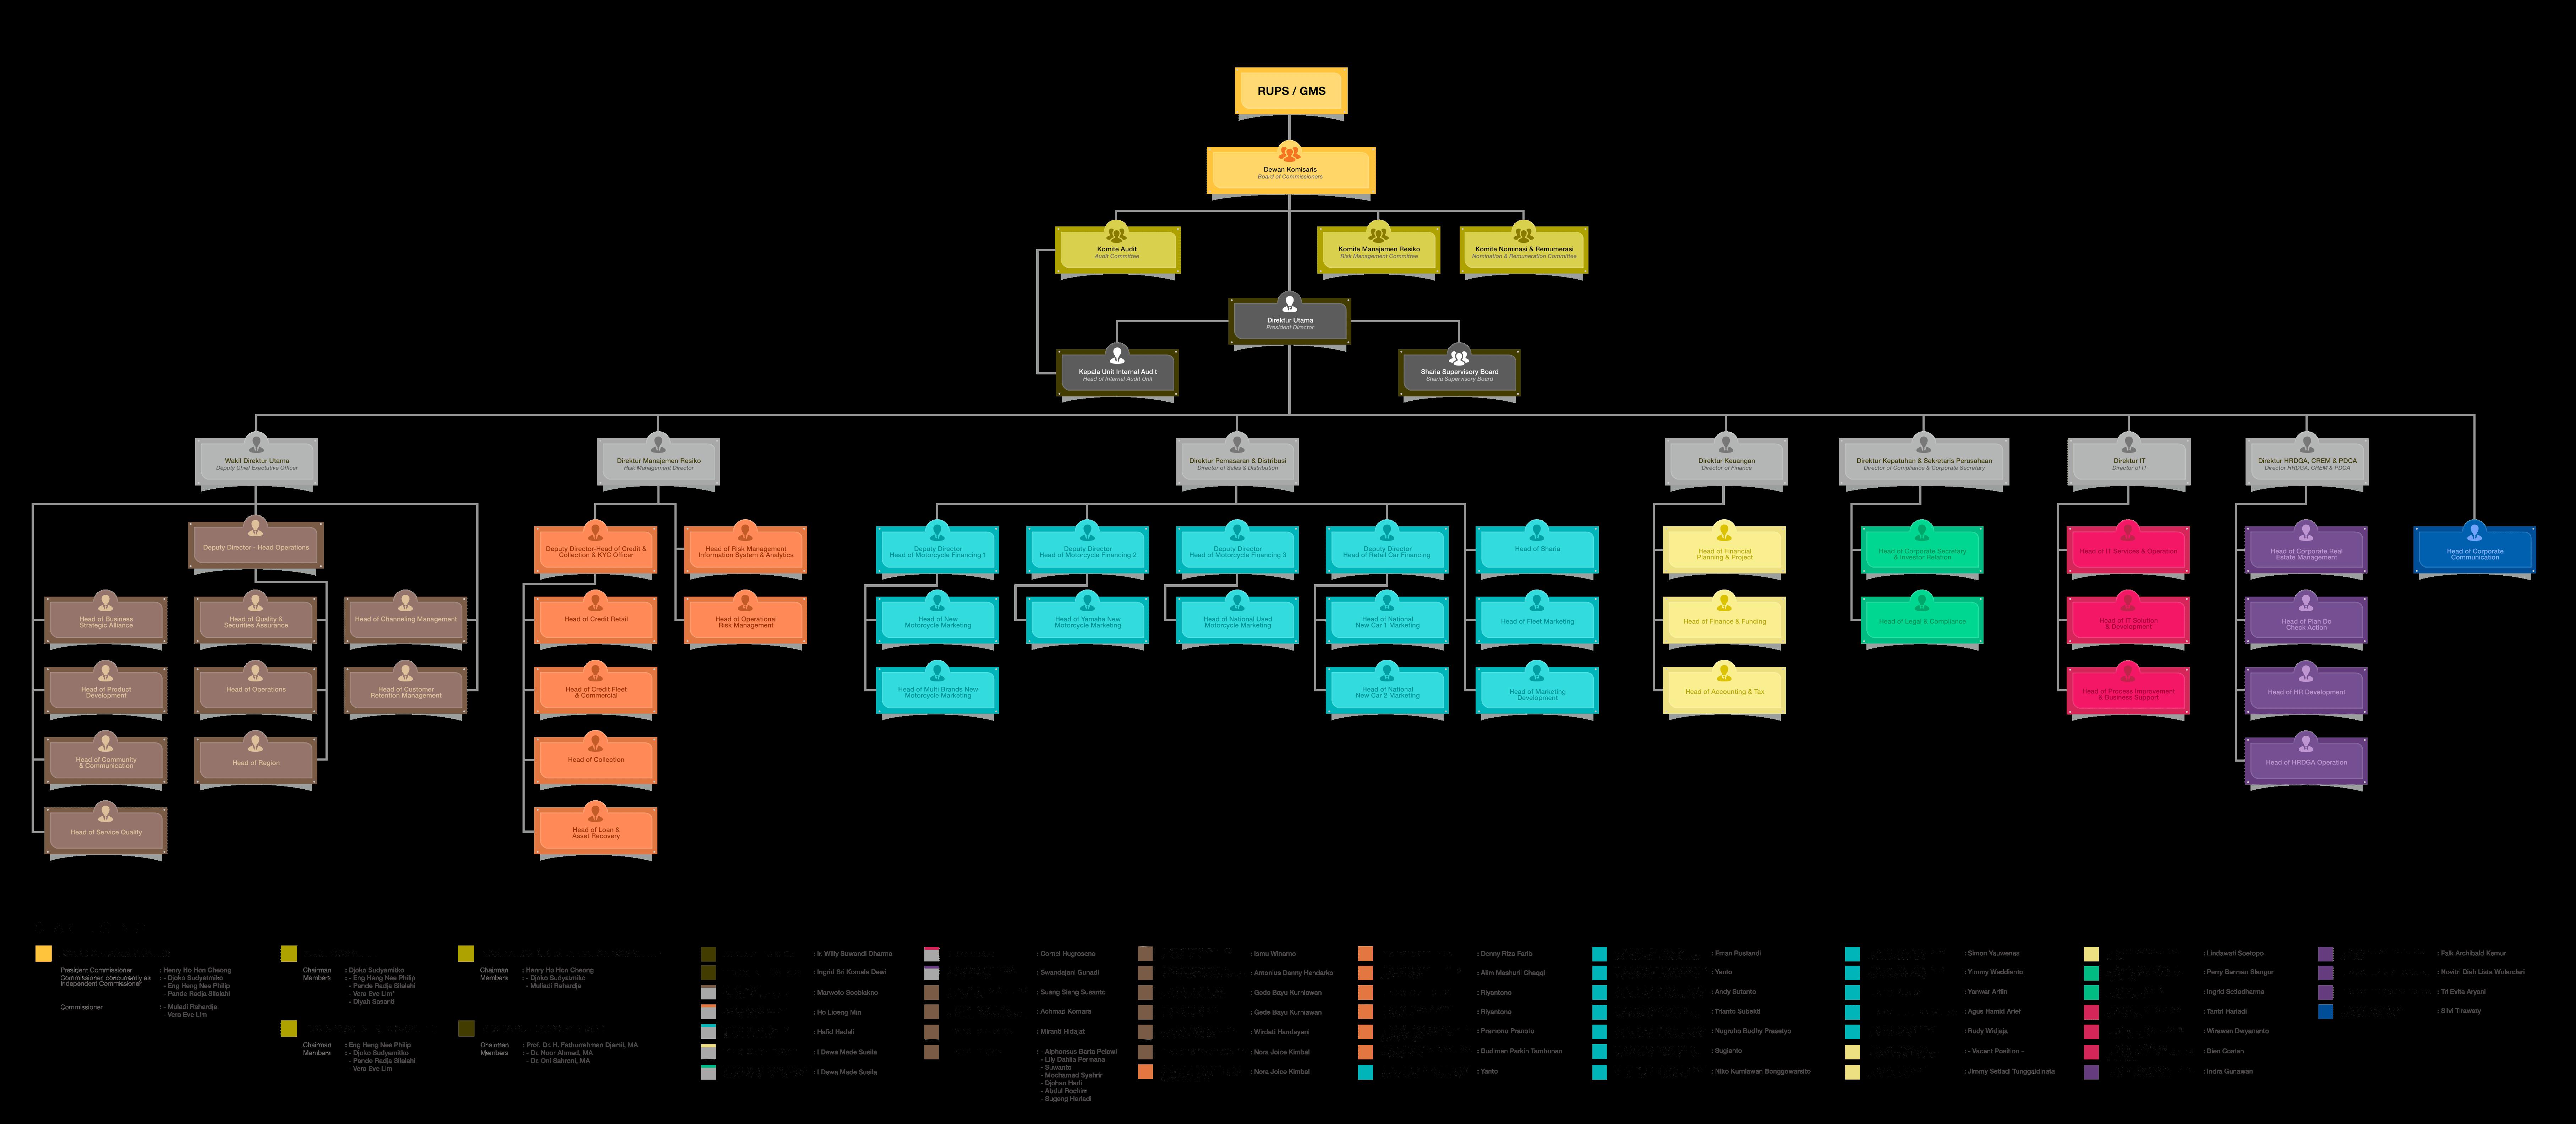 struktur-adira-large-enhanced